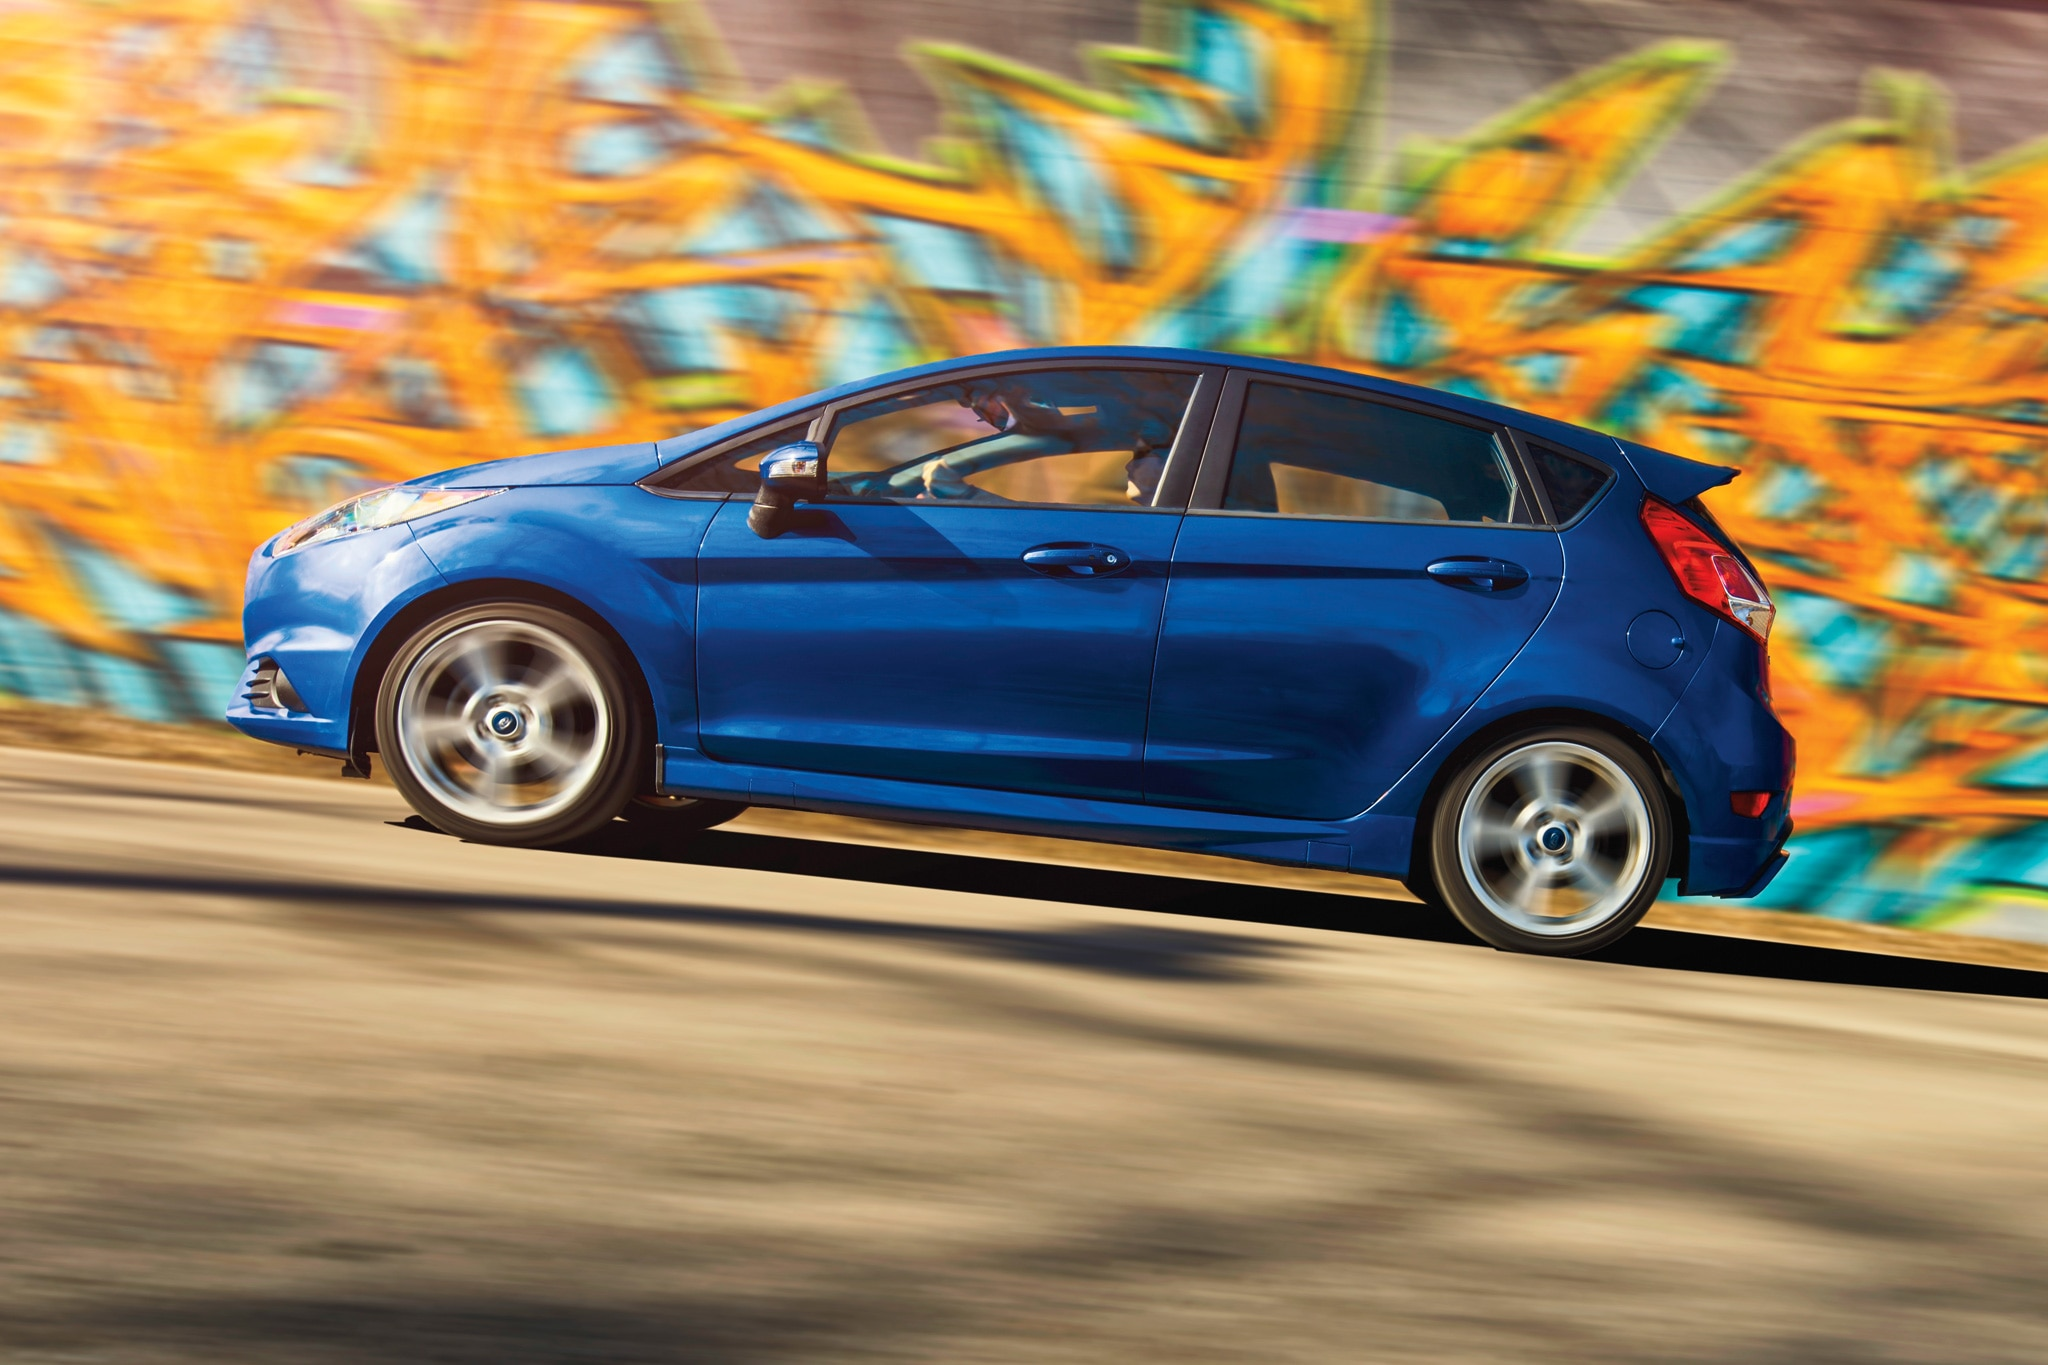 2014 Ford Fiesta ST Side Profile In Motion1